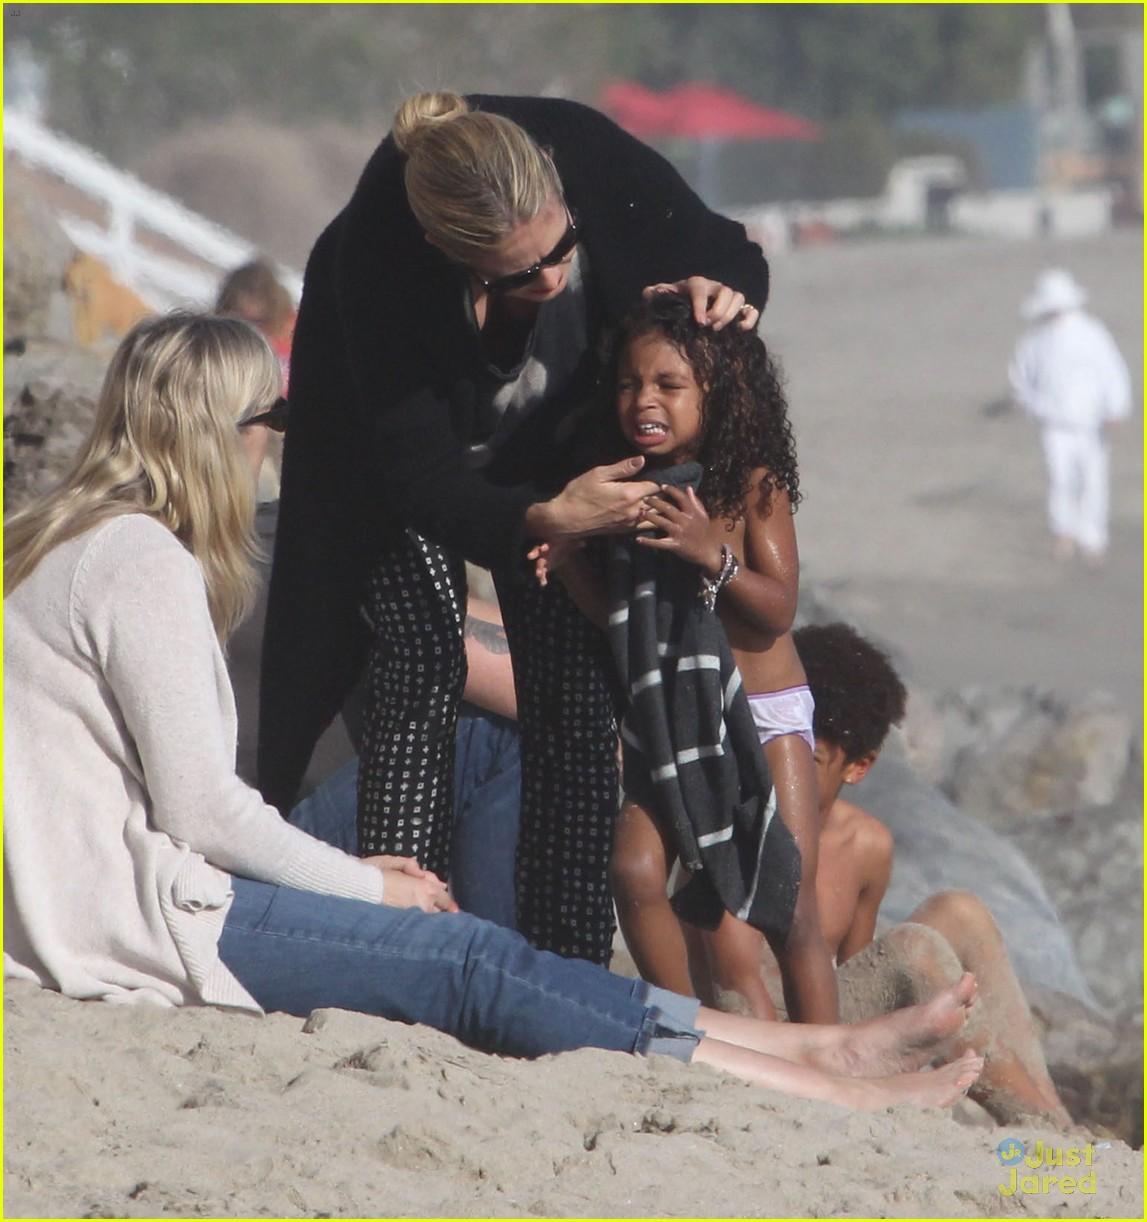 heidi klum martin kirsten beach day with the kids 222814912